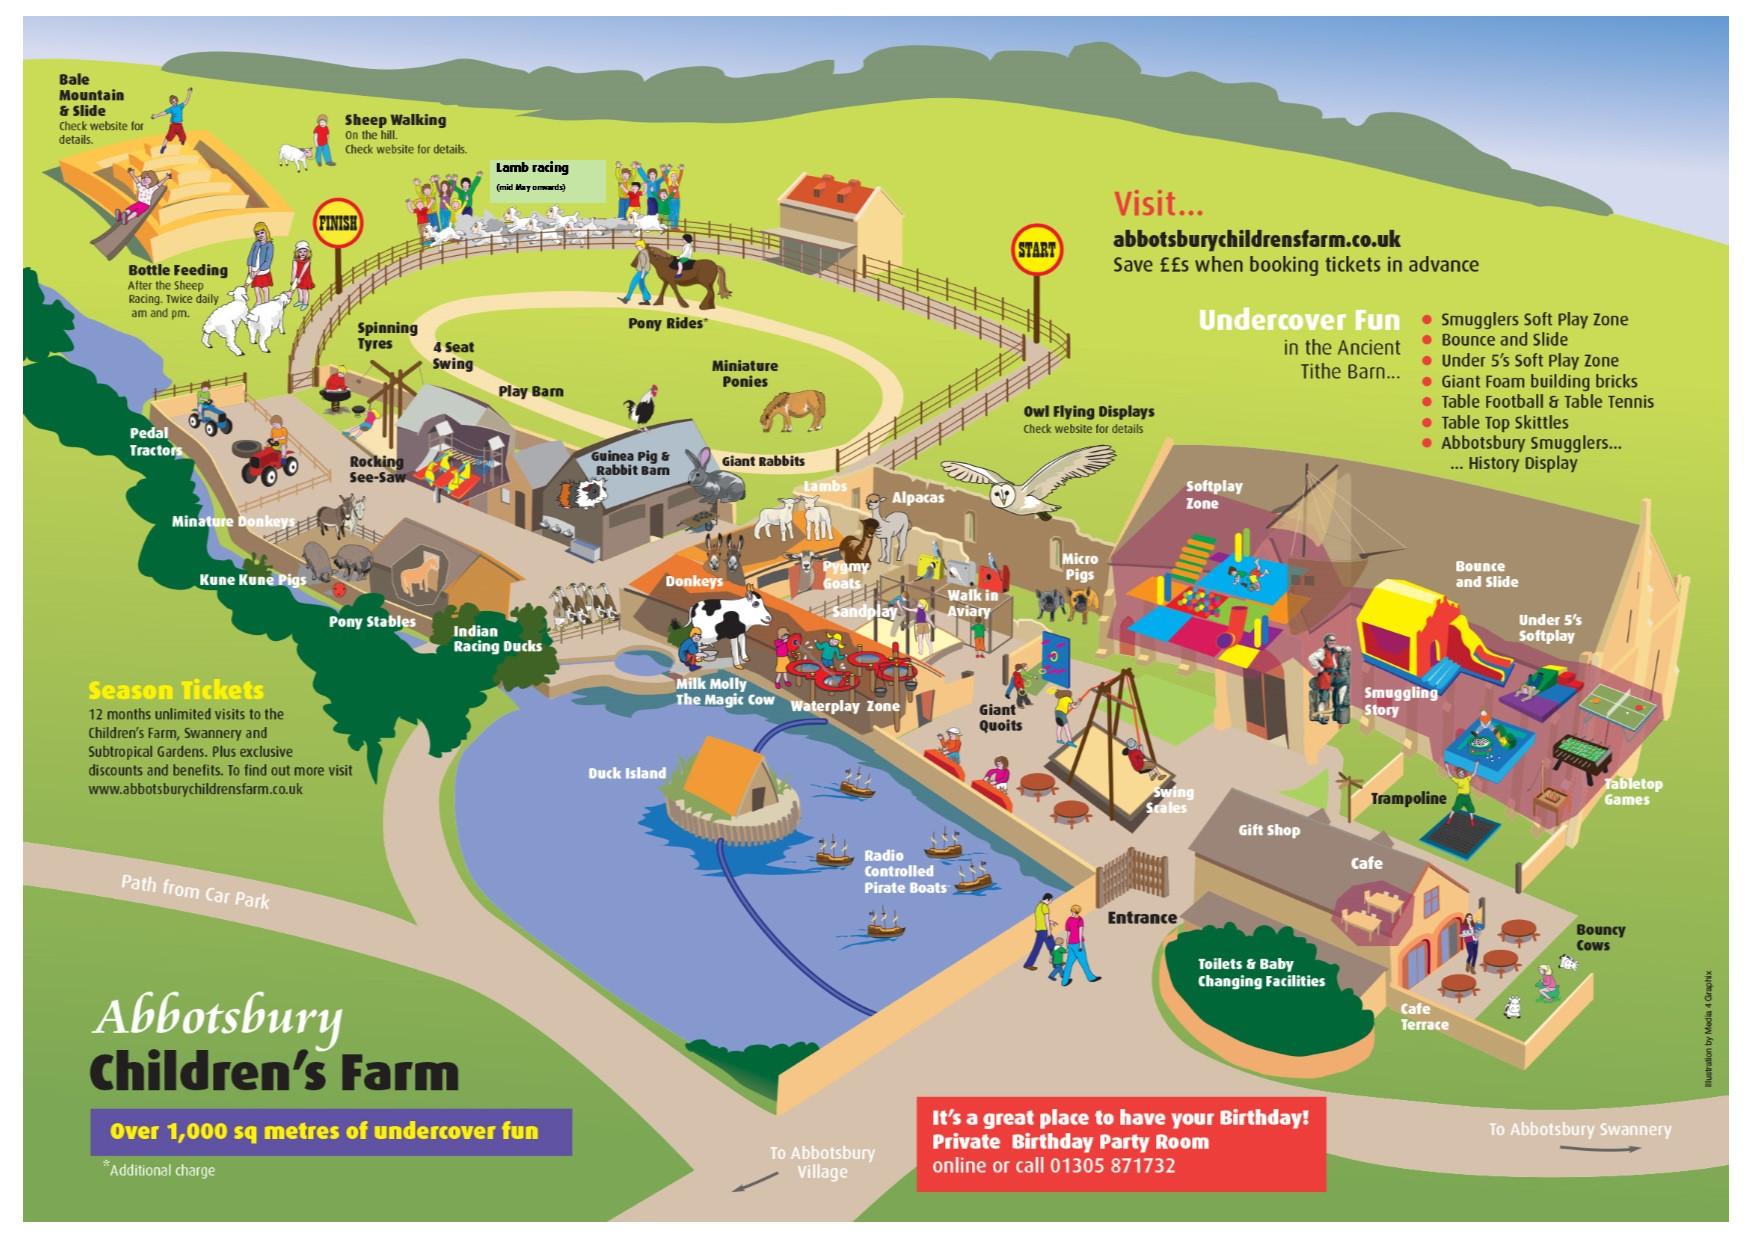 Abbotsbury Children's Farm map 2017